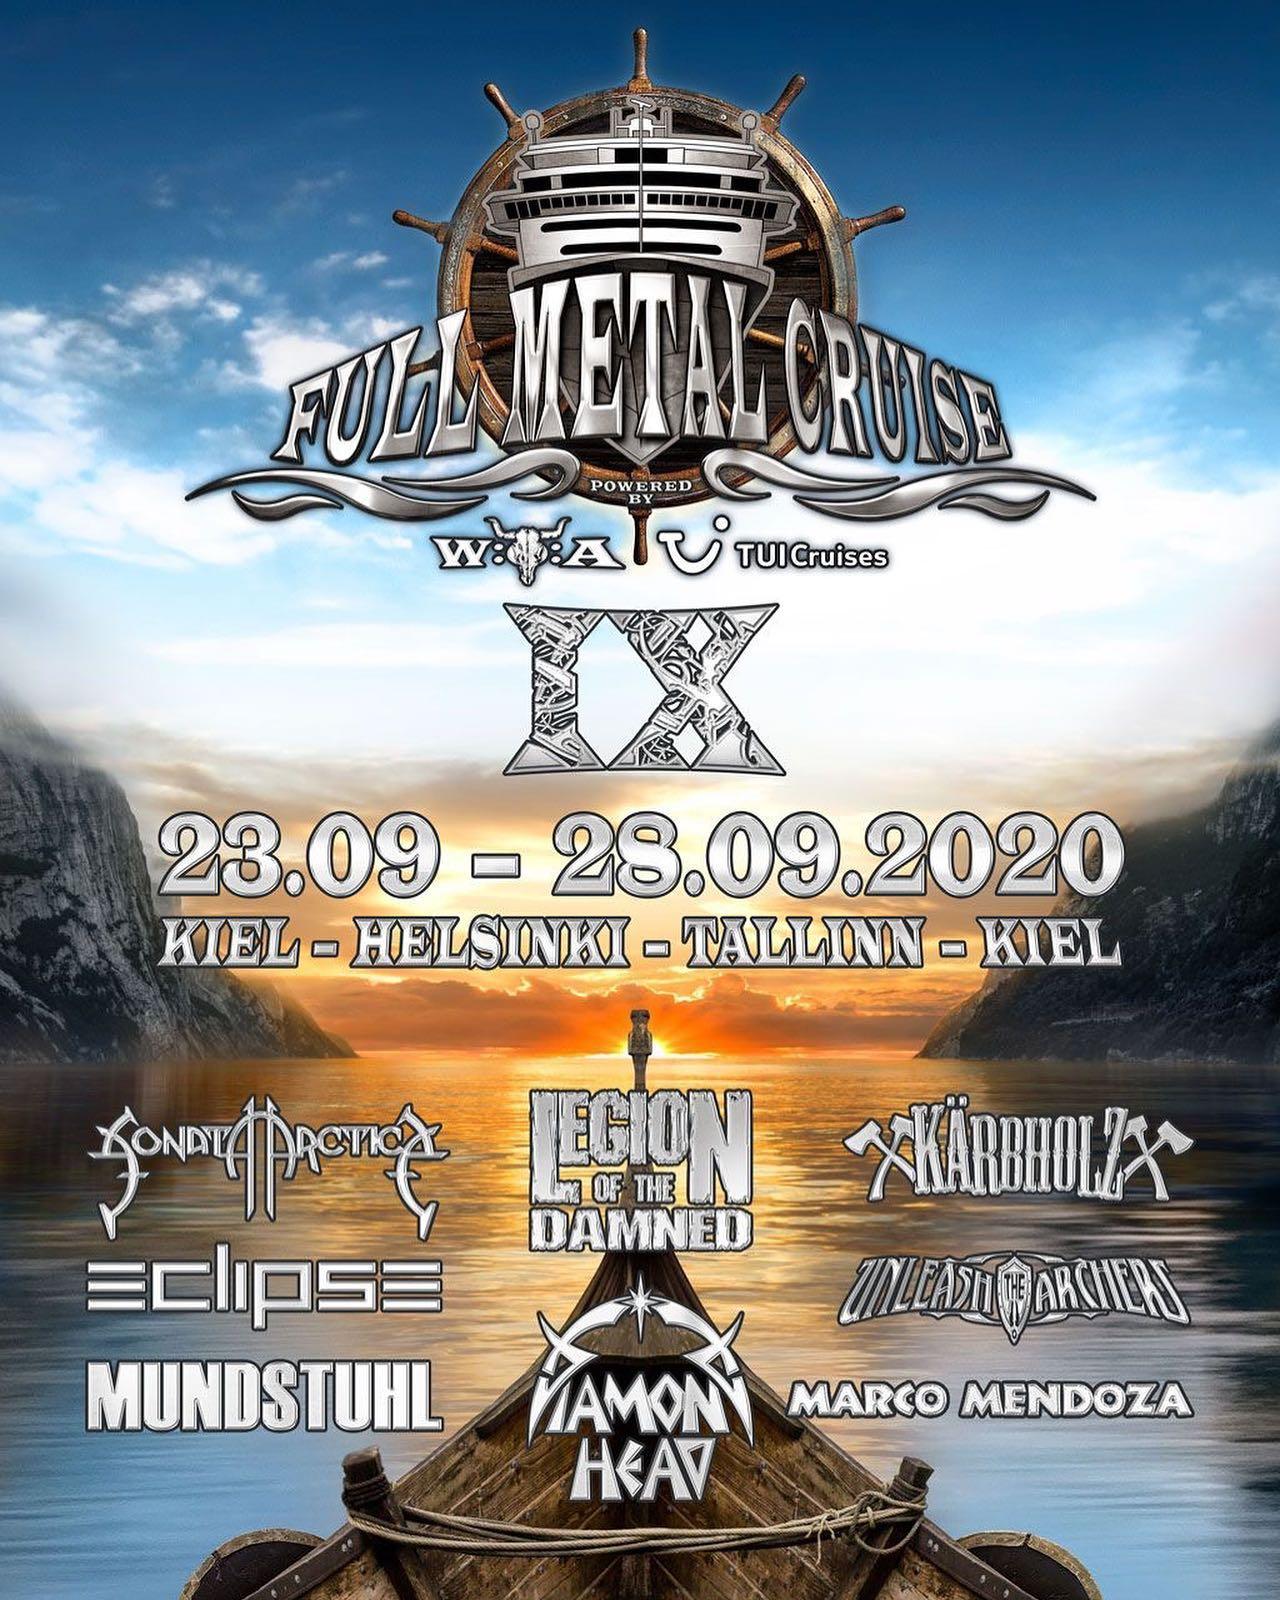 Full Metal Cruise2020